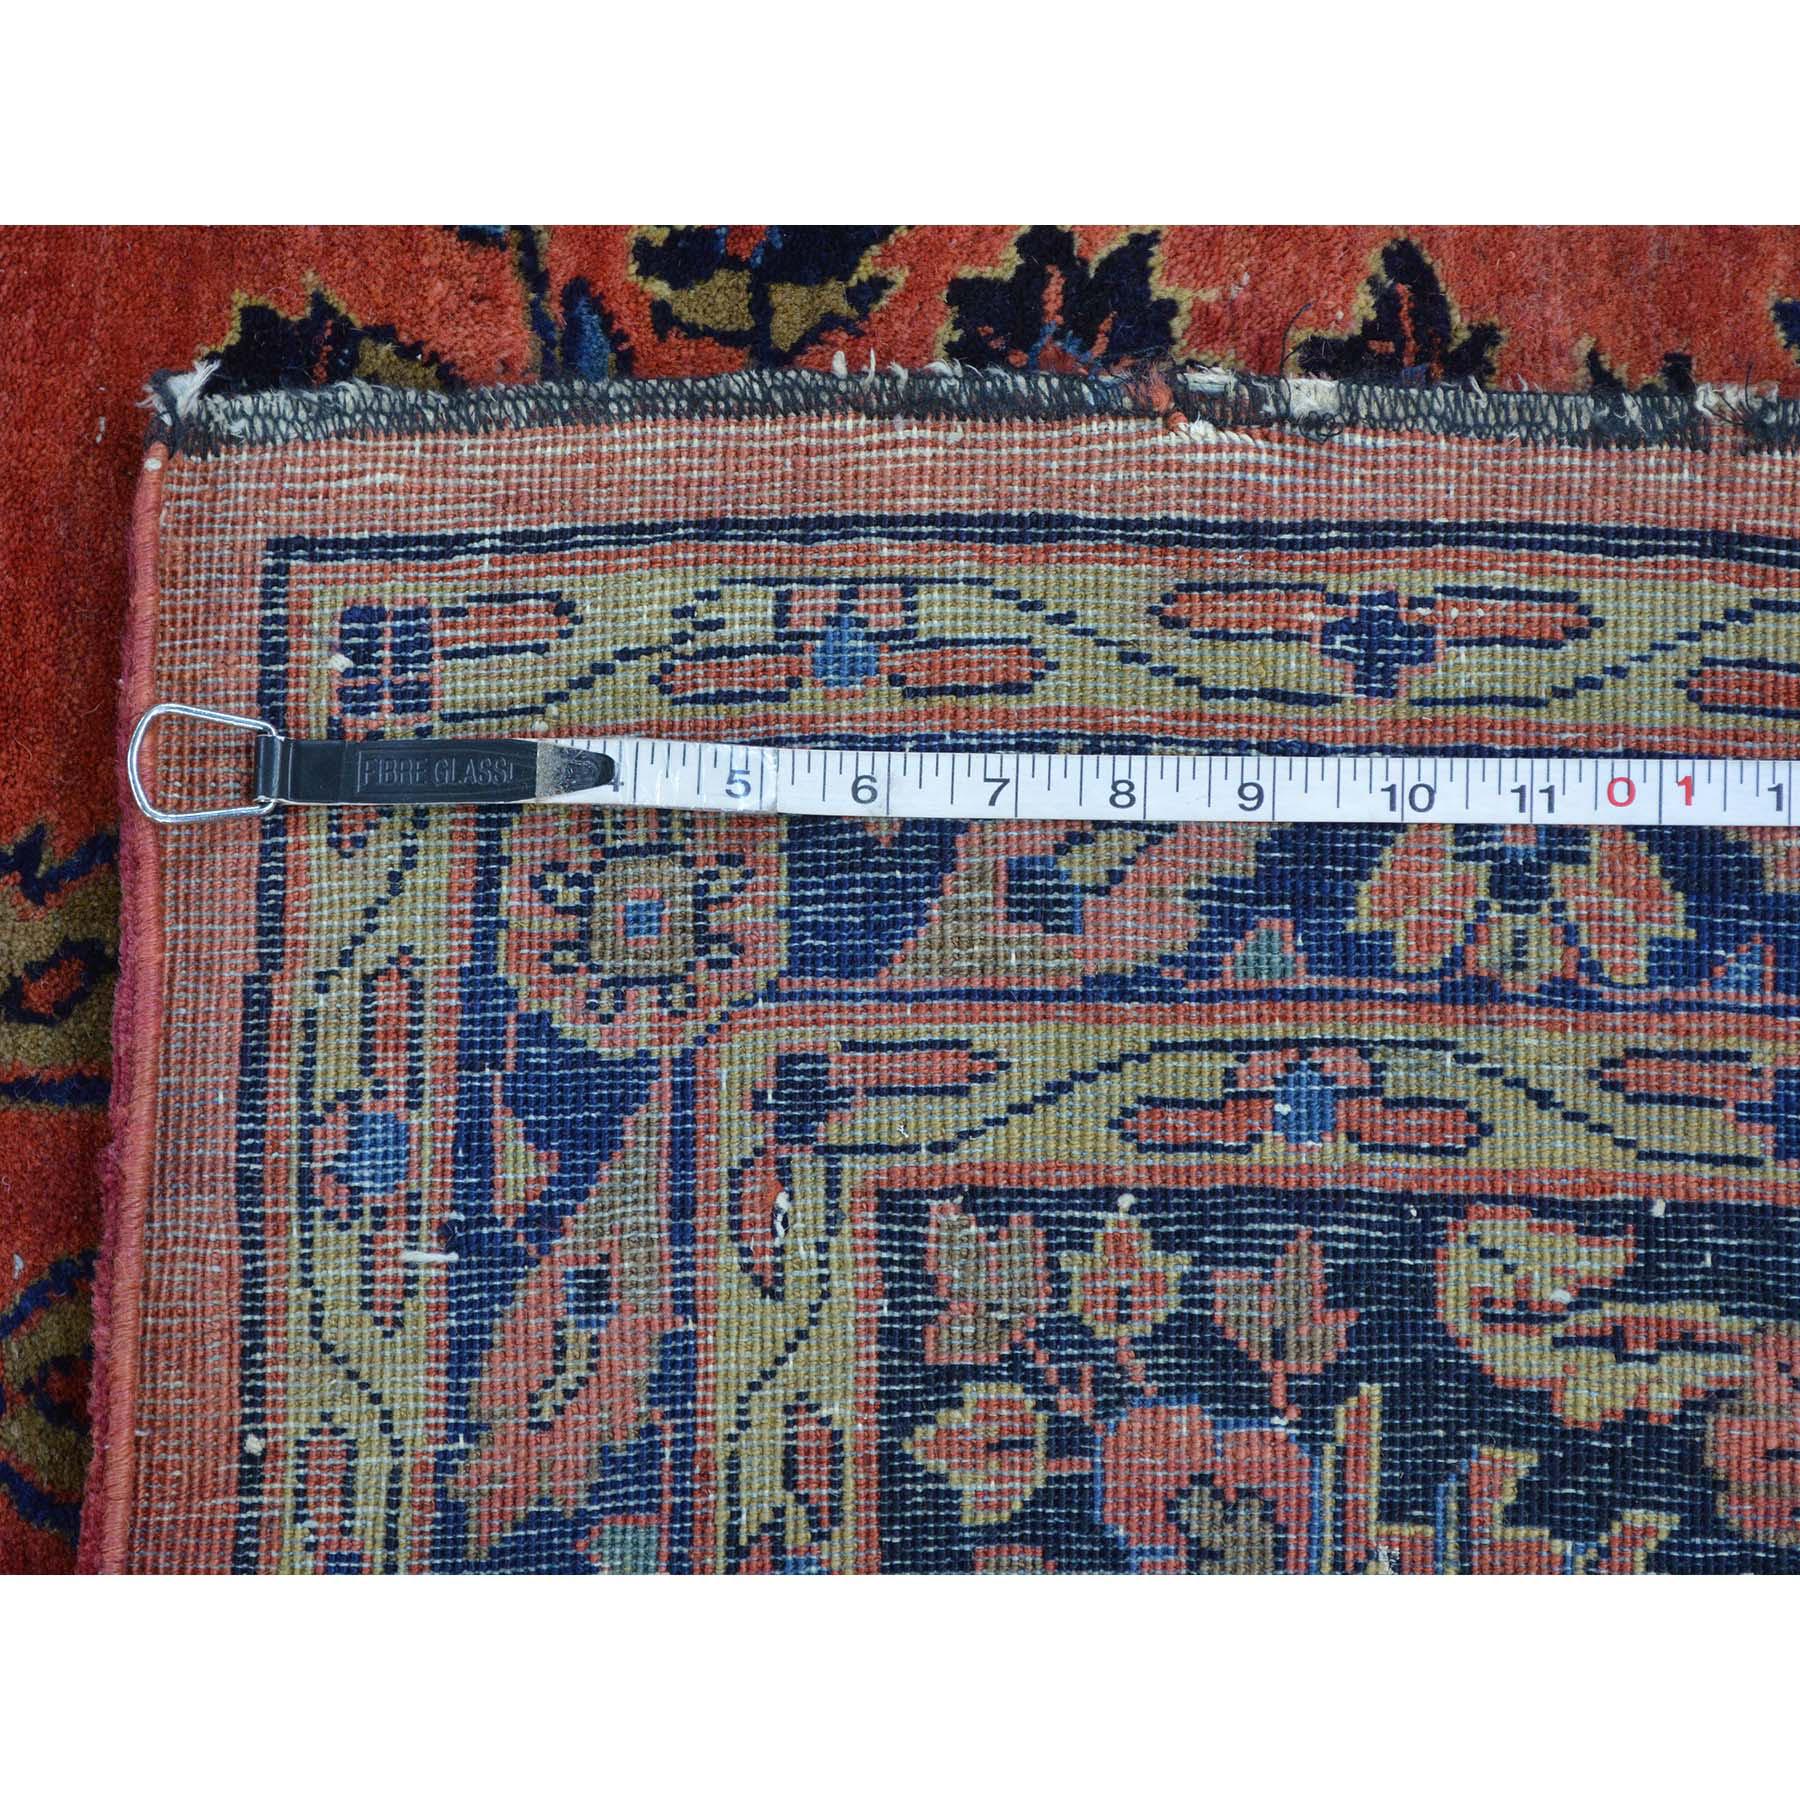 12-4 x19-3  Antique Persian Maharajan Sarouk Full Pile and Soft Rug